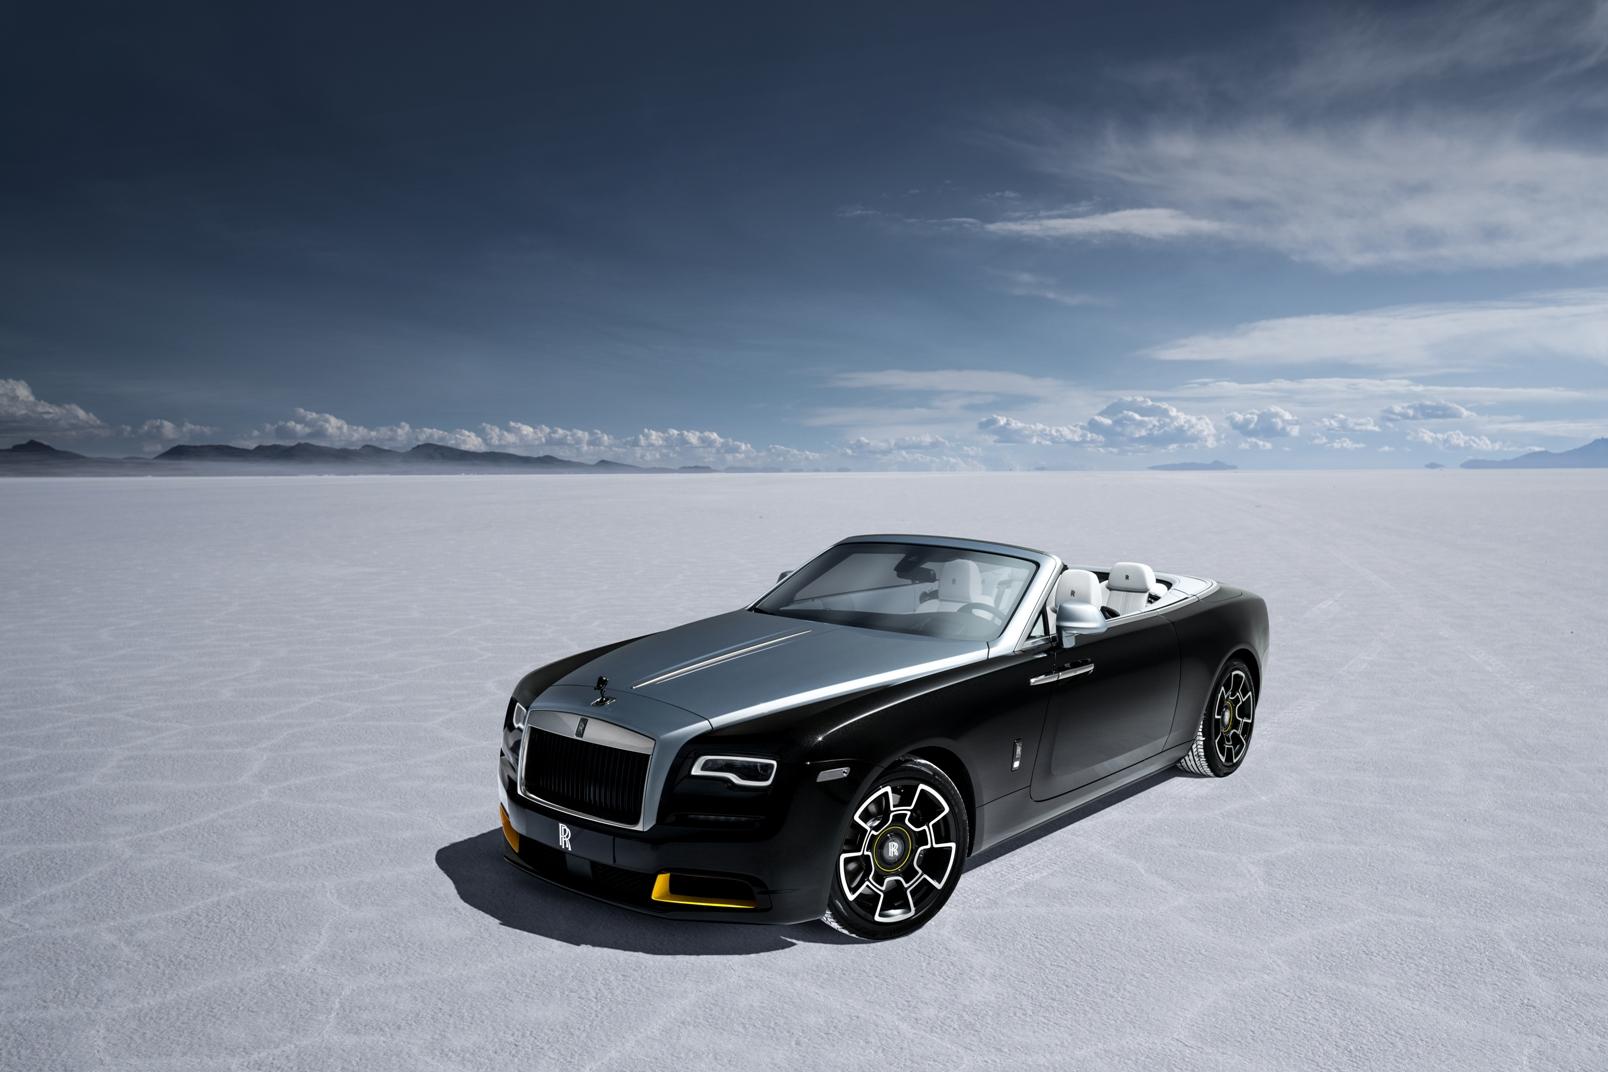 Rolls Royce Landspeed Collection (6)